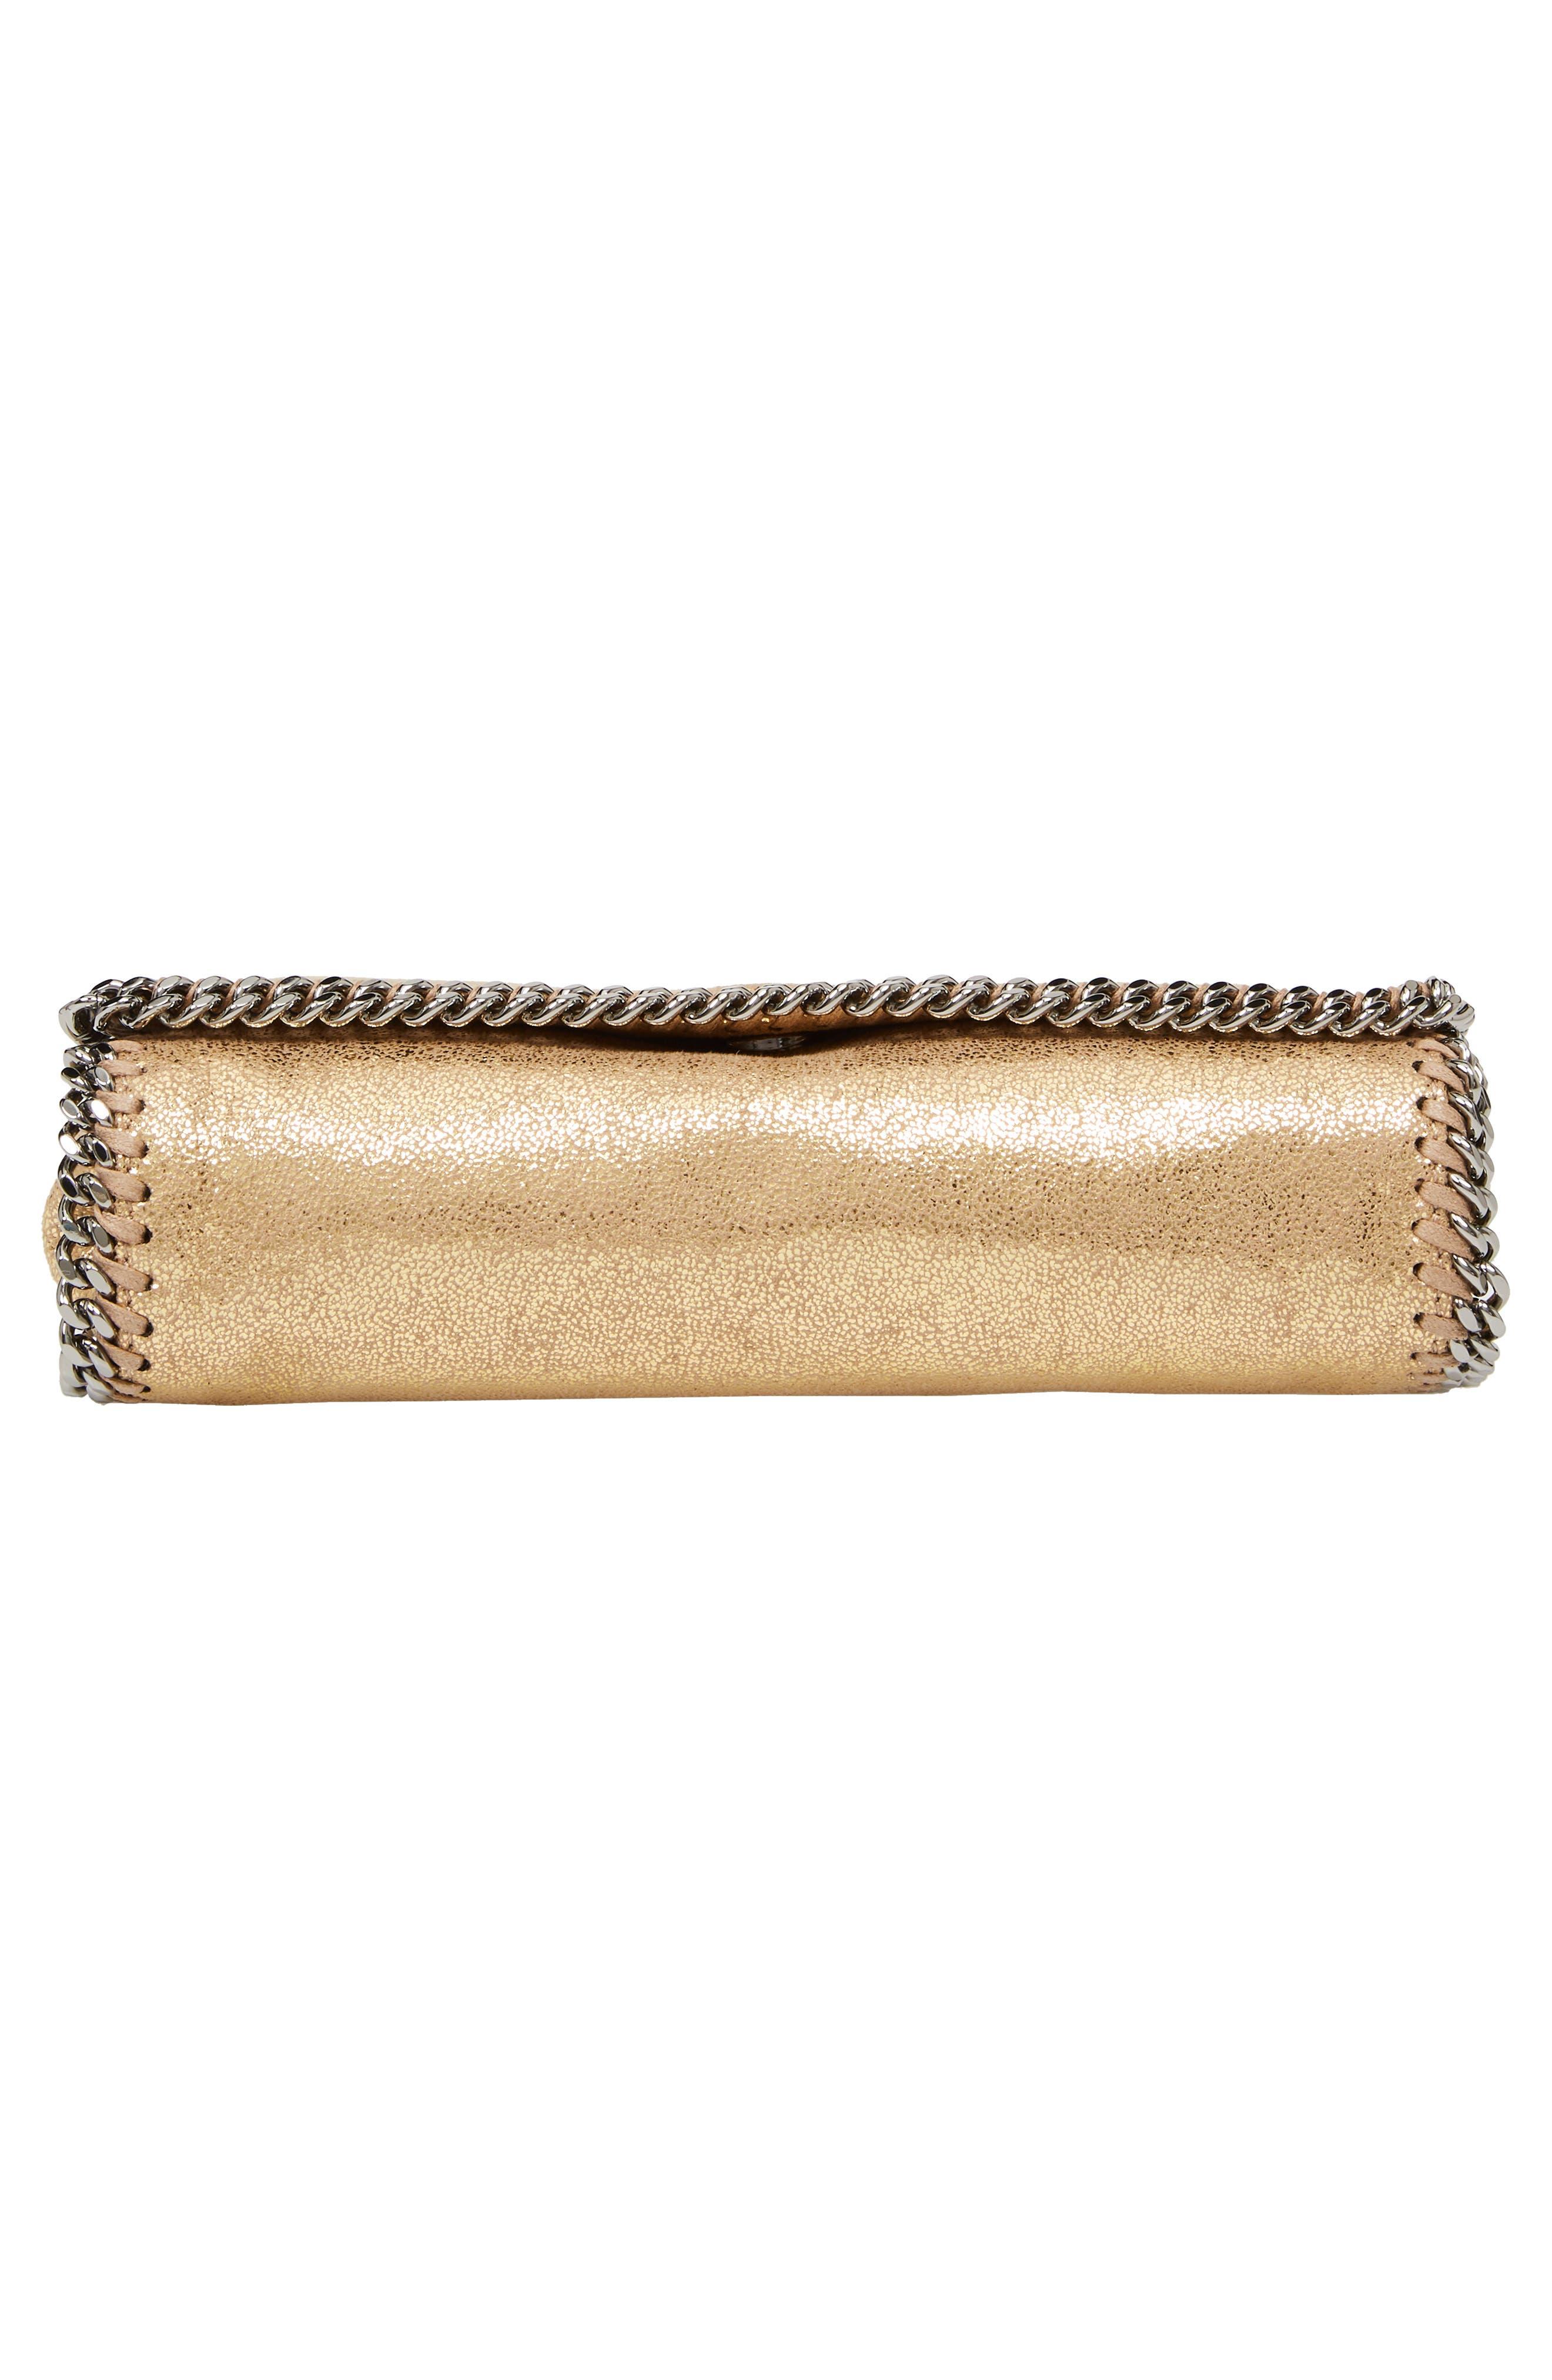 'Falabella' Crossbody Bag,                             Alternate thumbnail 4, color,                             Gold